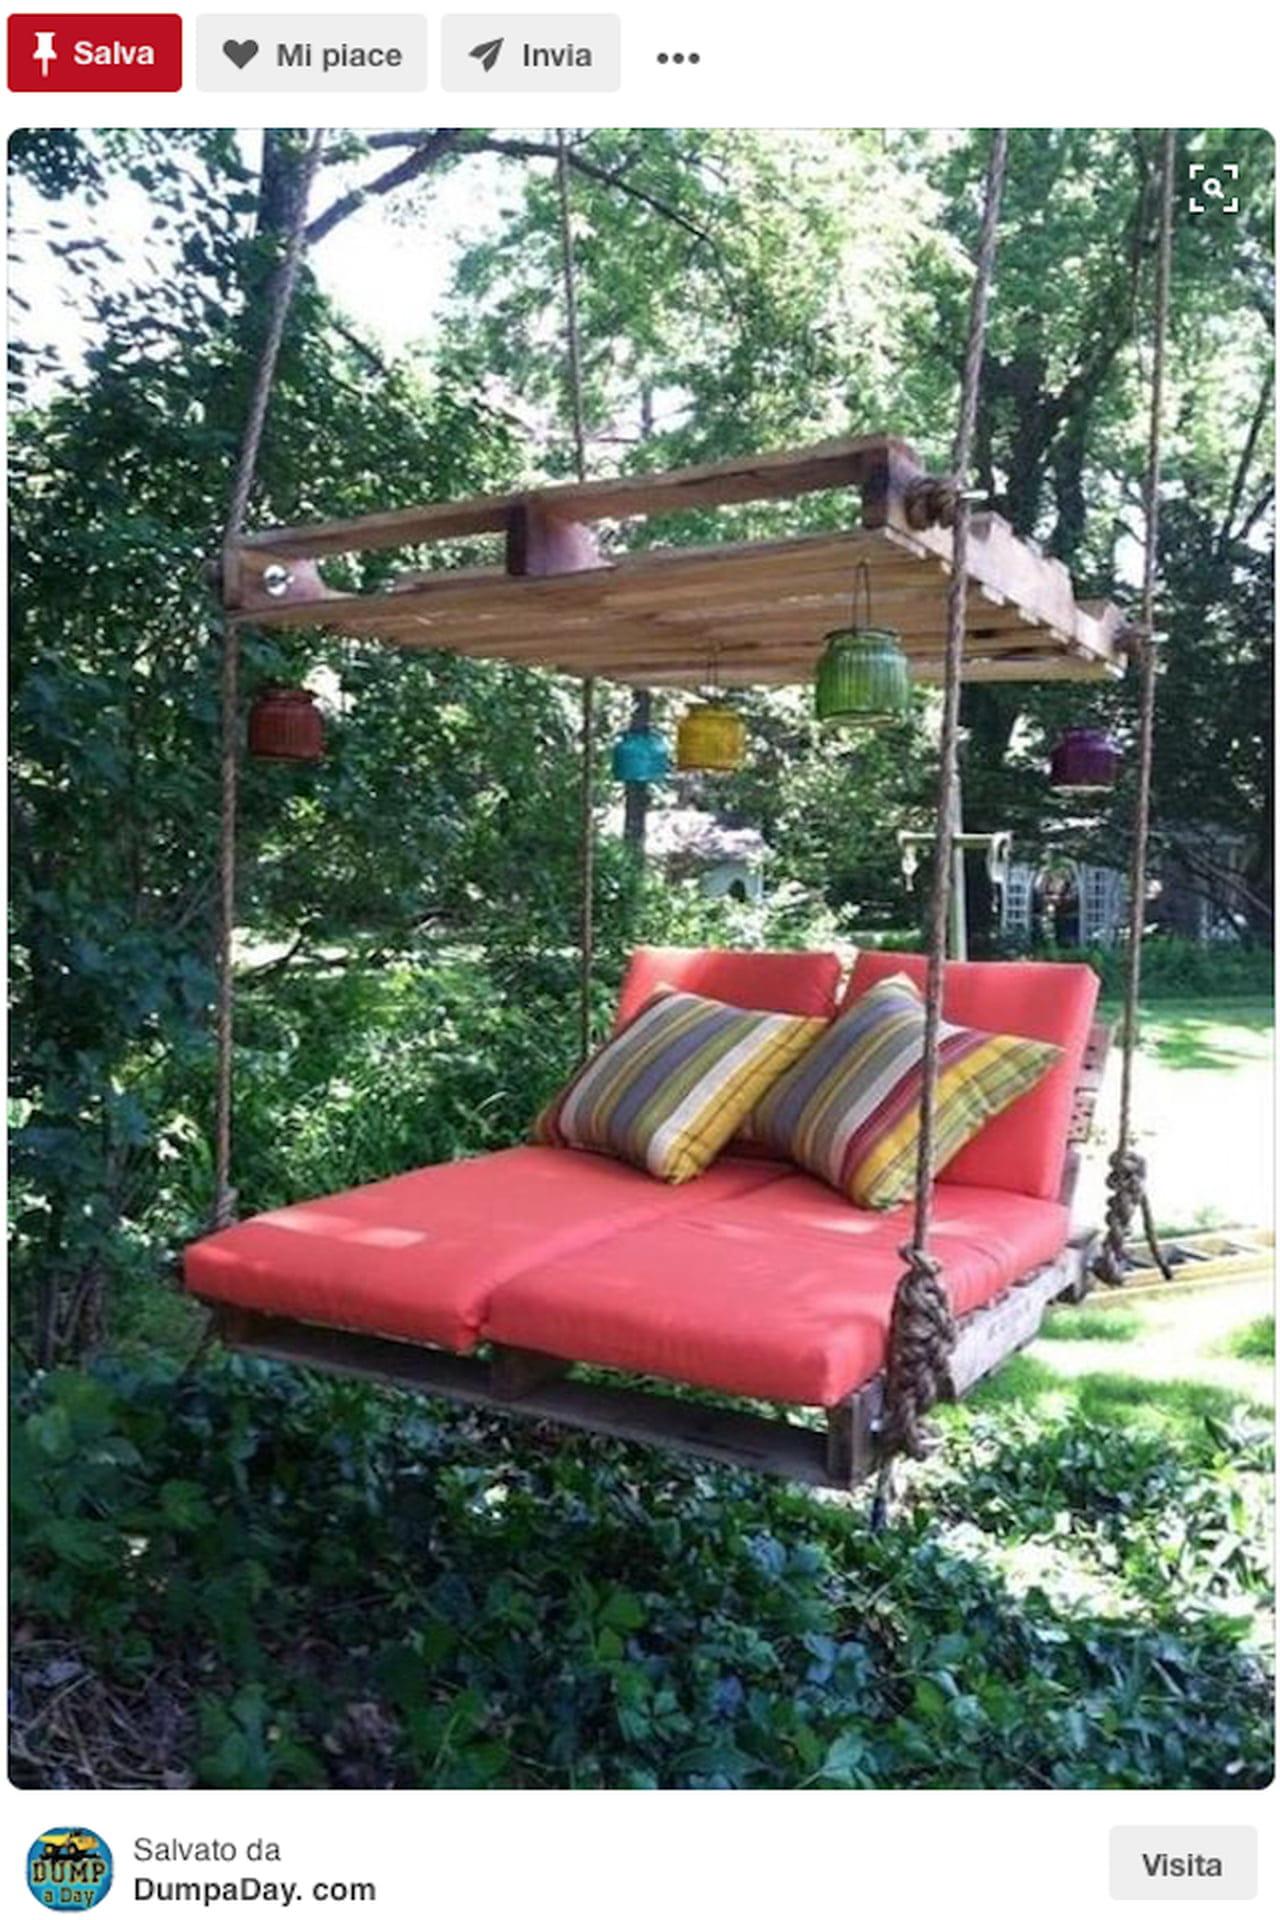 Creazioni fai da te idee giardino da pinterest for Creazioni giardini